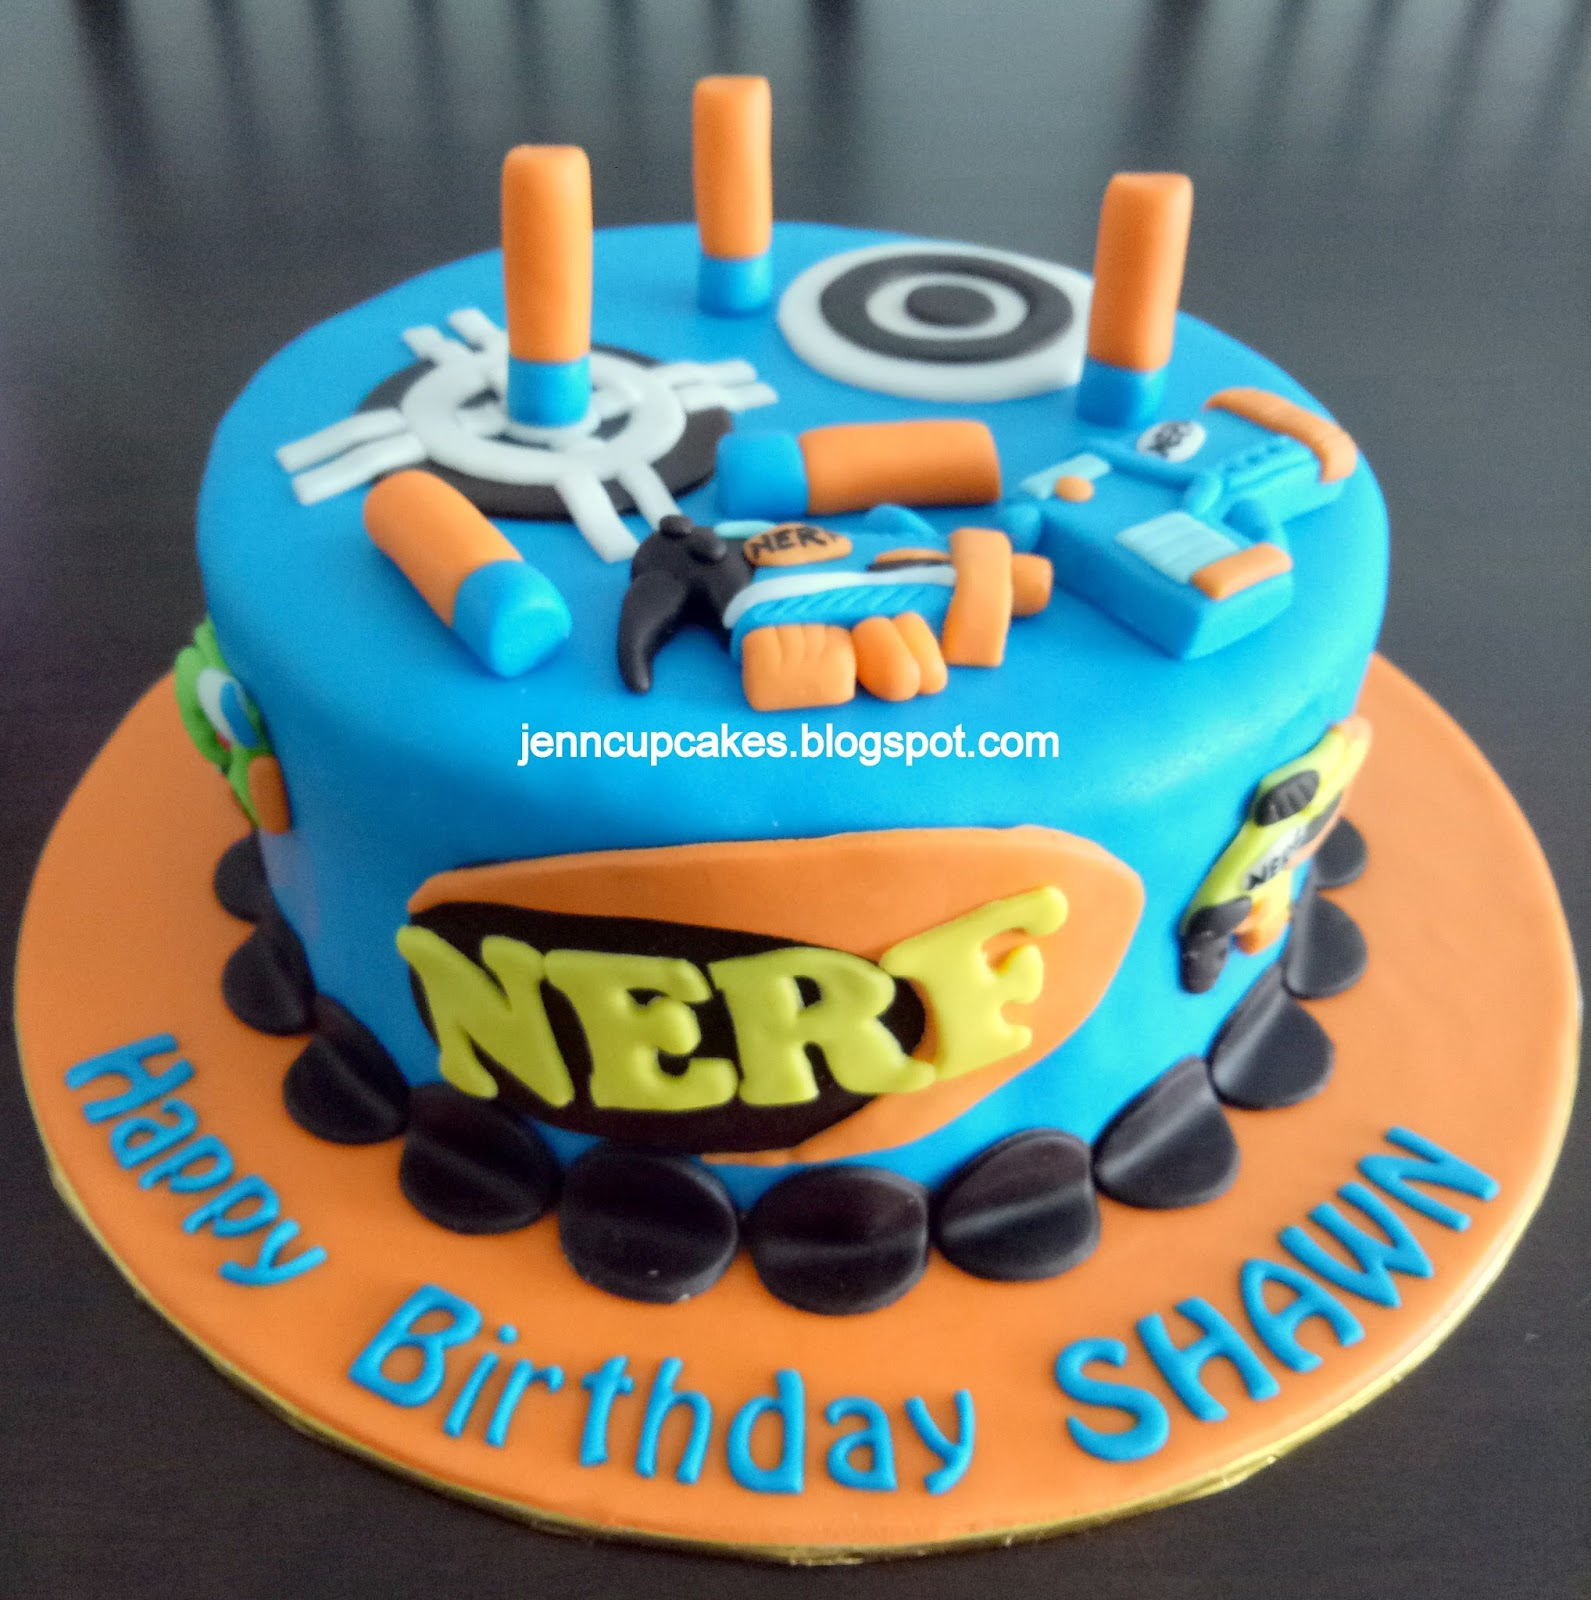 Jenn Cupcakes Muffins Nerf Theme Cake